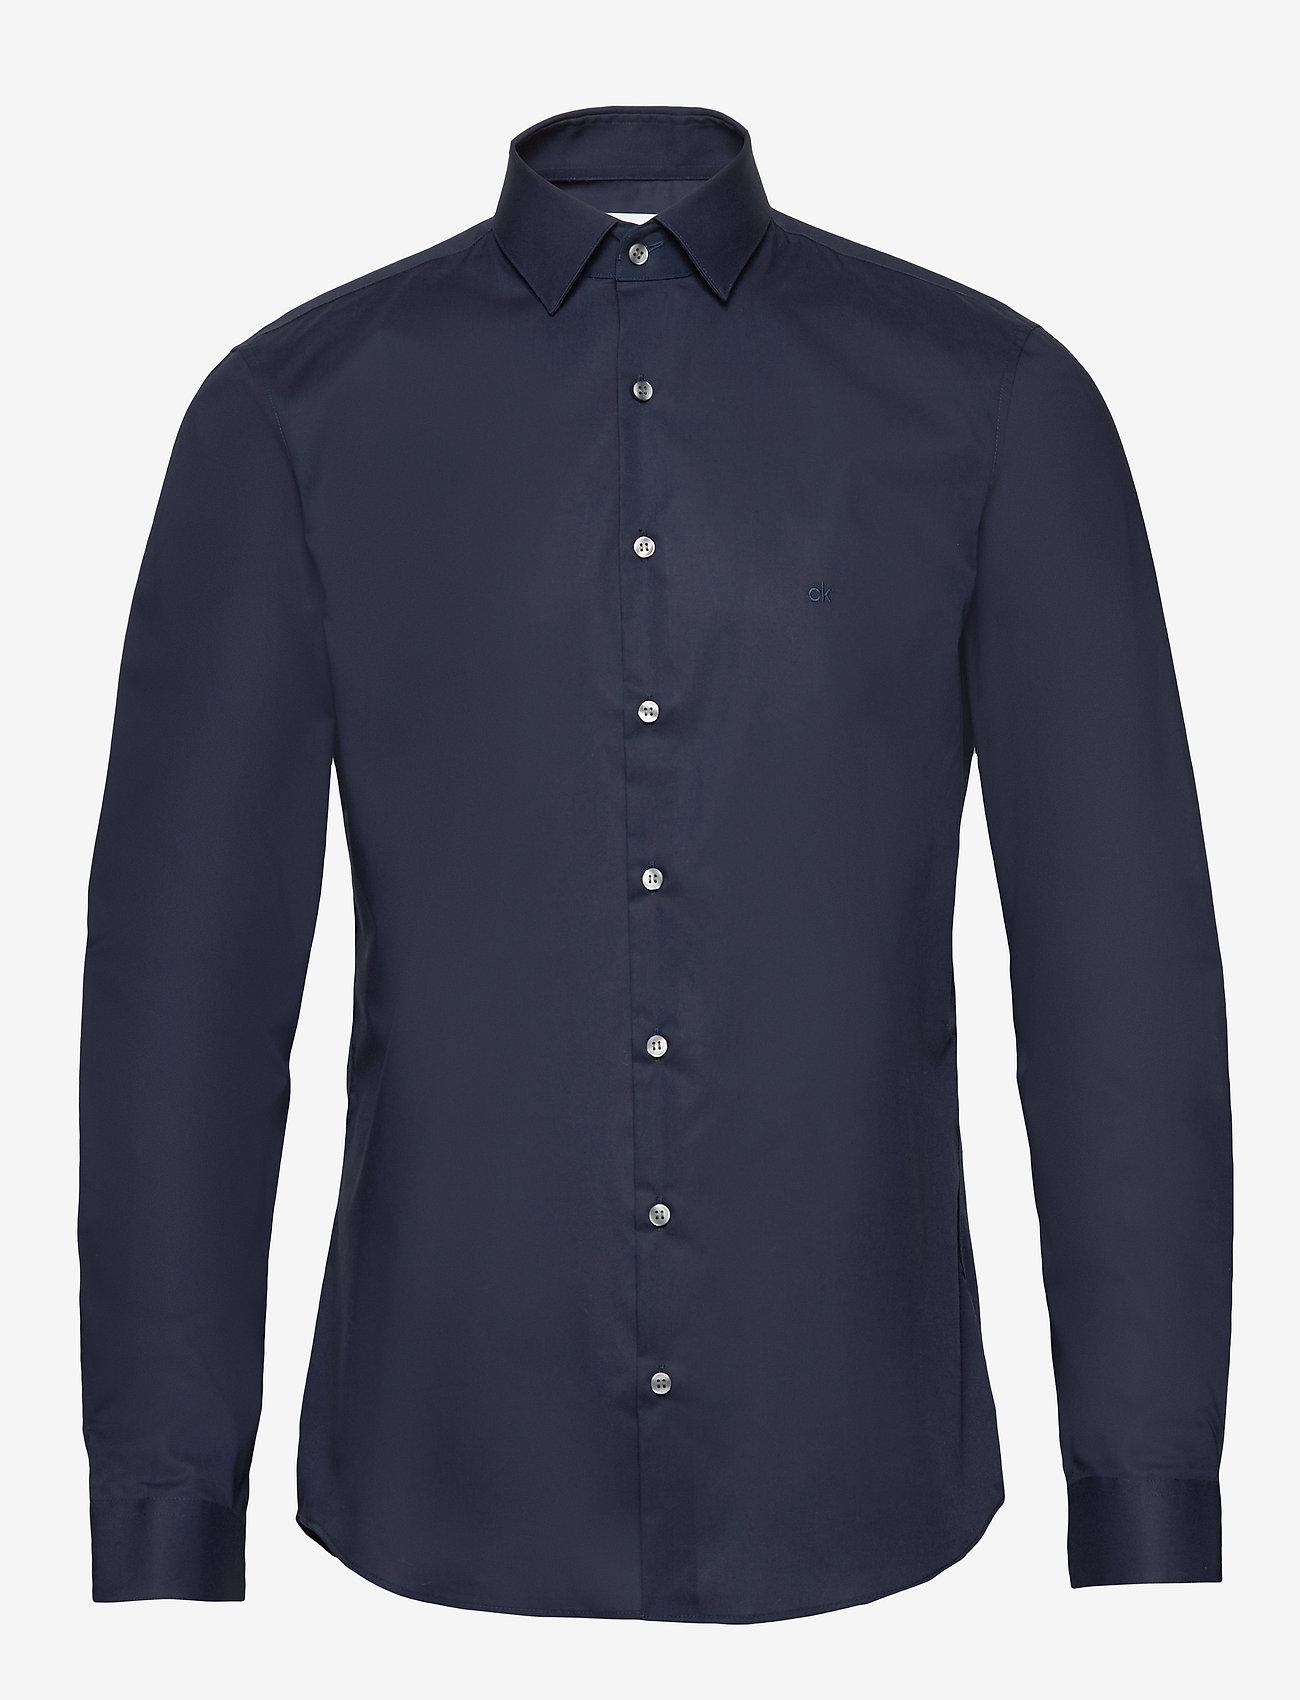 Calvin Klein - 2PLY POPLIN STRETCH SLIM SHIRT - basic shirts - midnight blue - 0